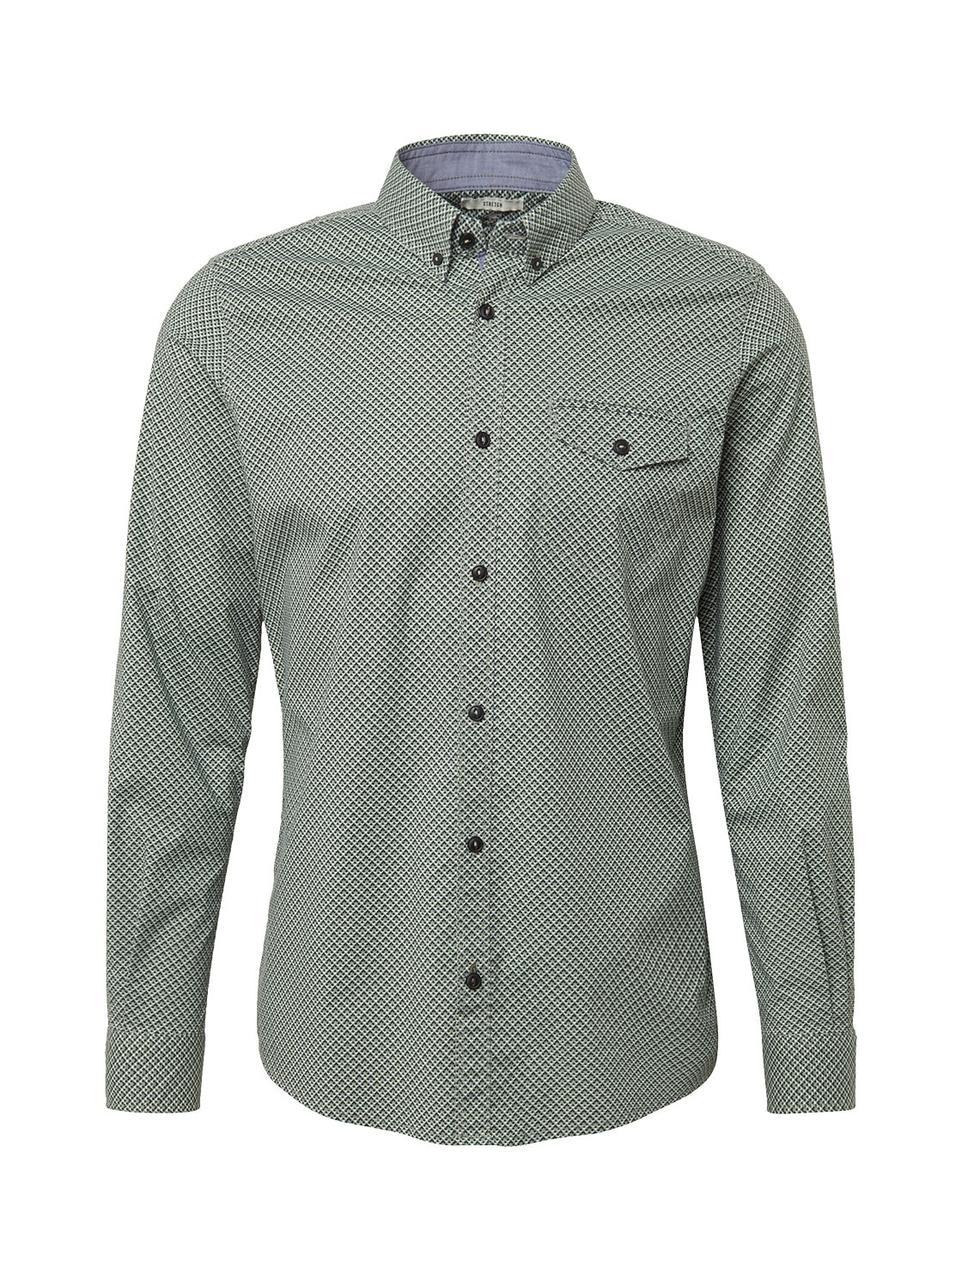 Рубашка Tom Tailor 1008552 S Зелёный